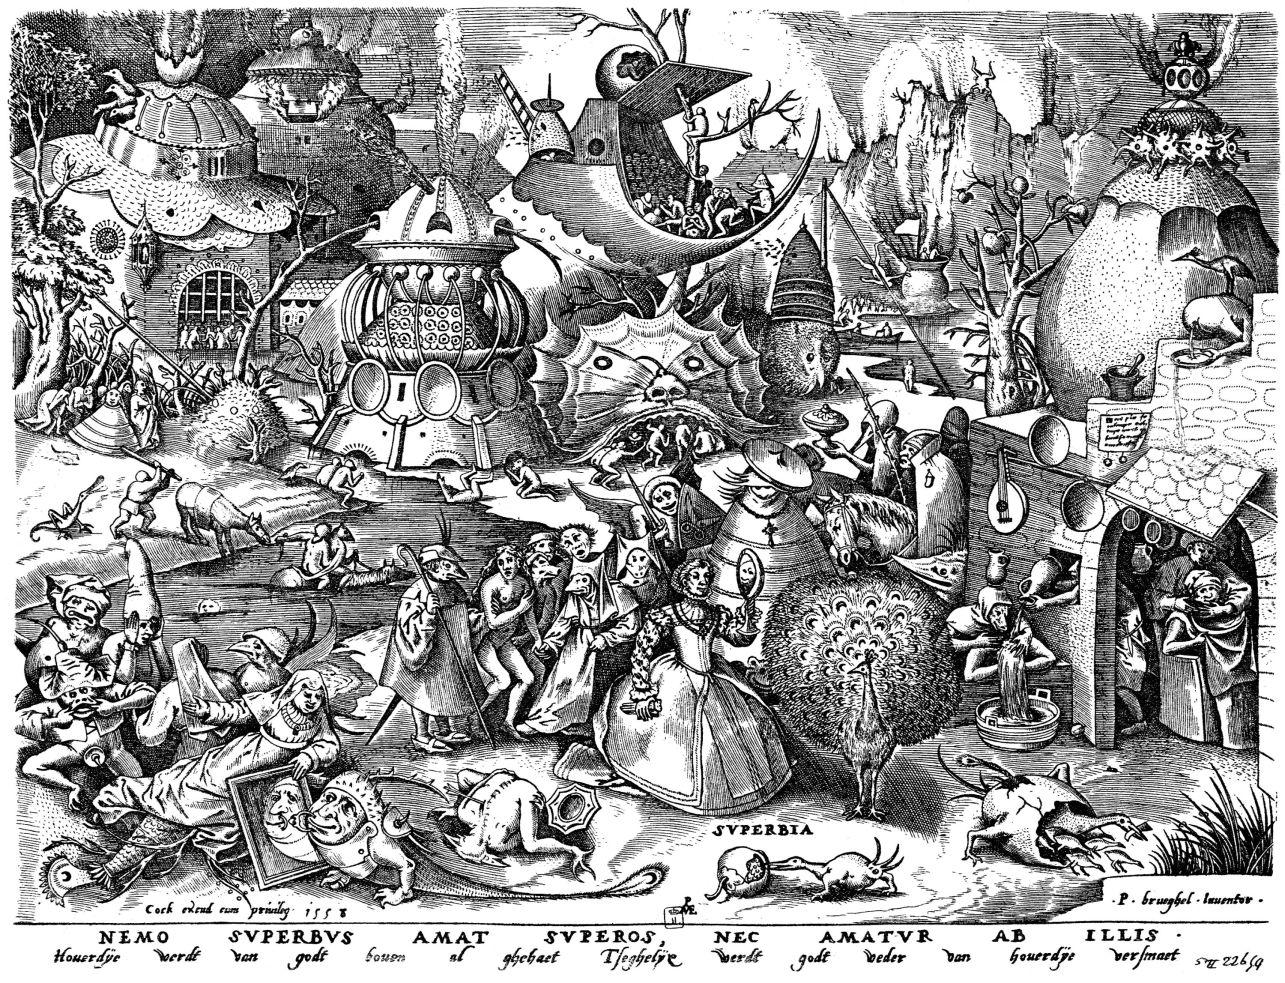 Brueghel_-_Sieben_Laster_-_Superbia